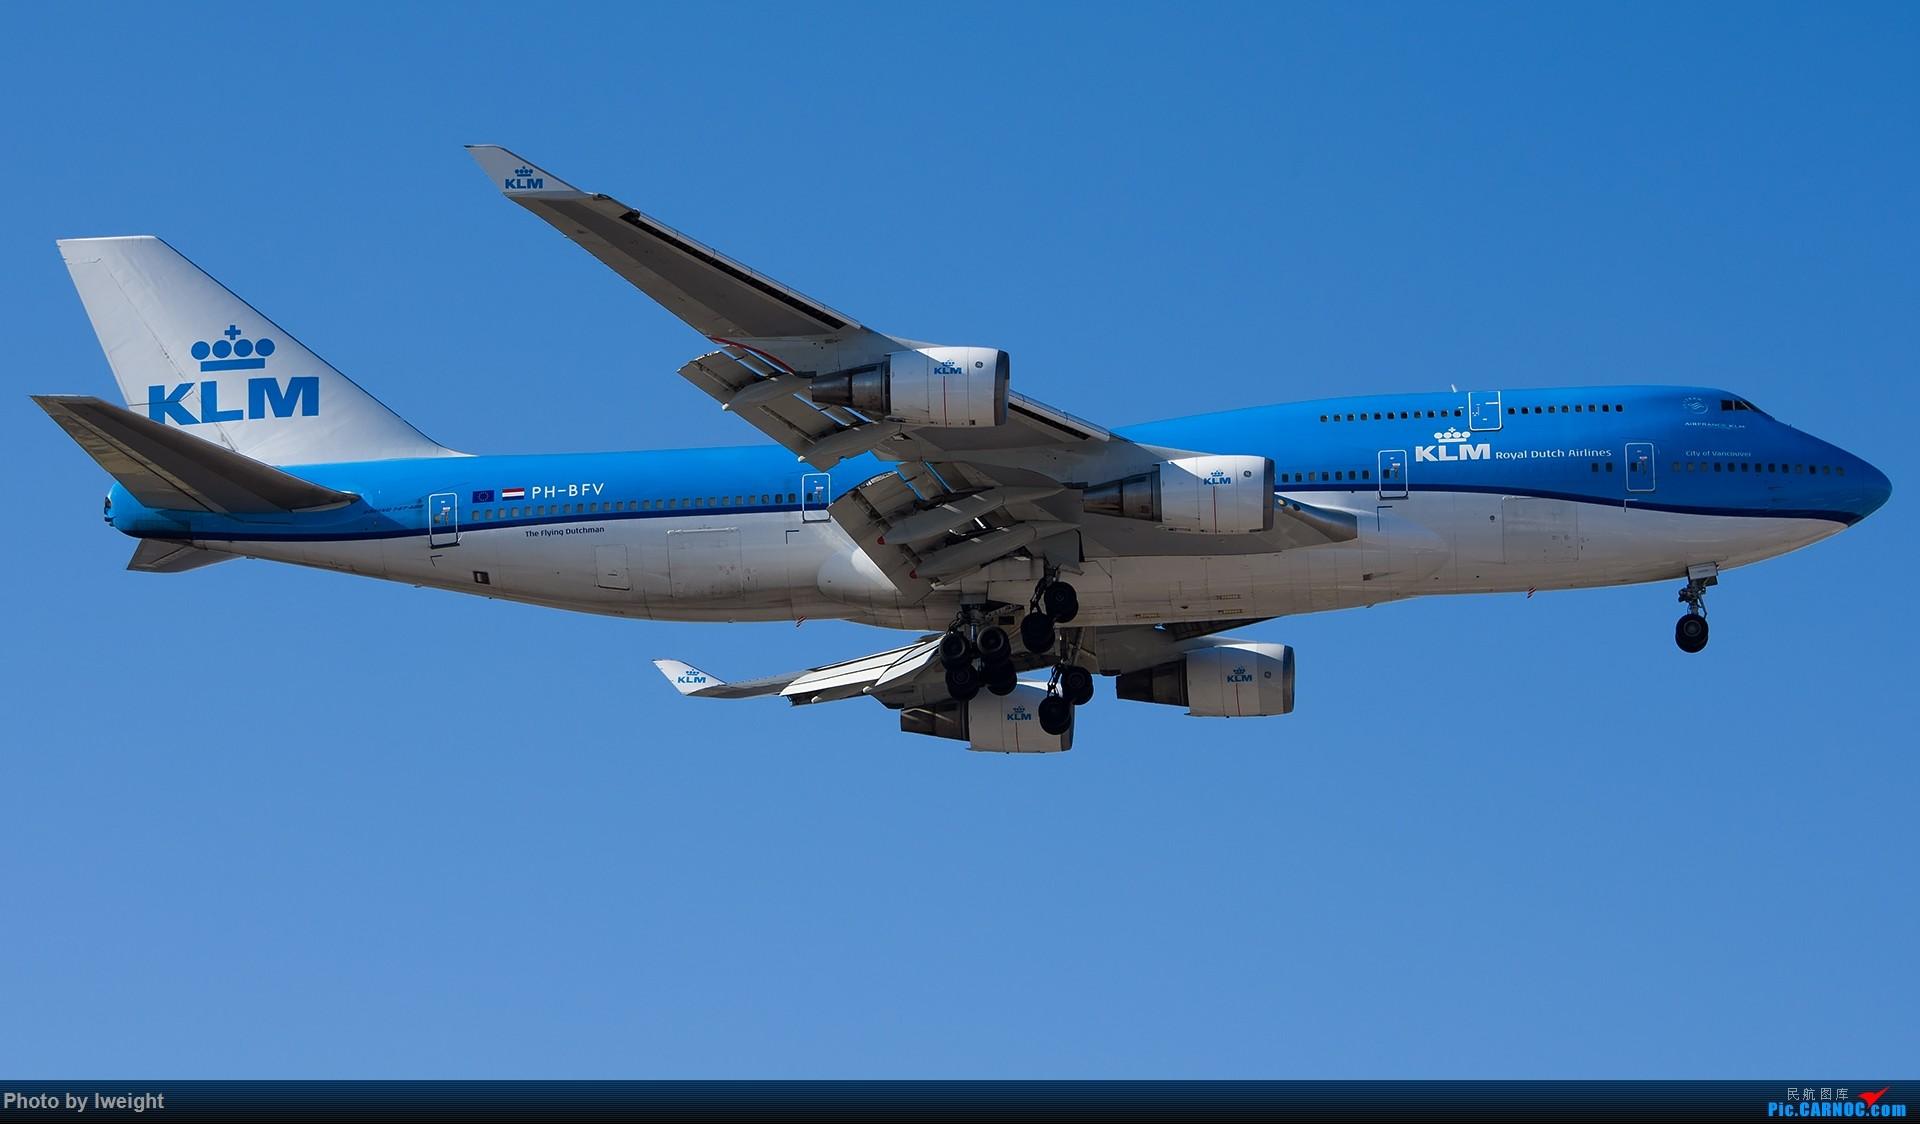 Re:[原创]终于在12月的北京等到了一个晴天的周末,出来拍拍飞机【2015-12-5】 BOEING 747-400 PH-BFV 中国北京首都国际机场